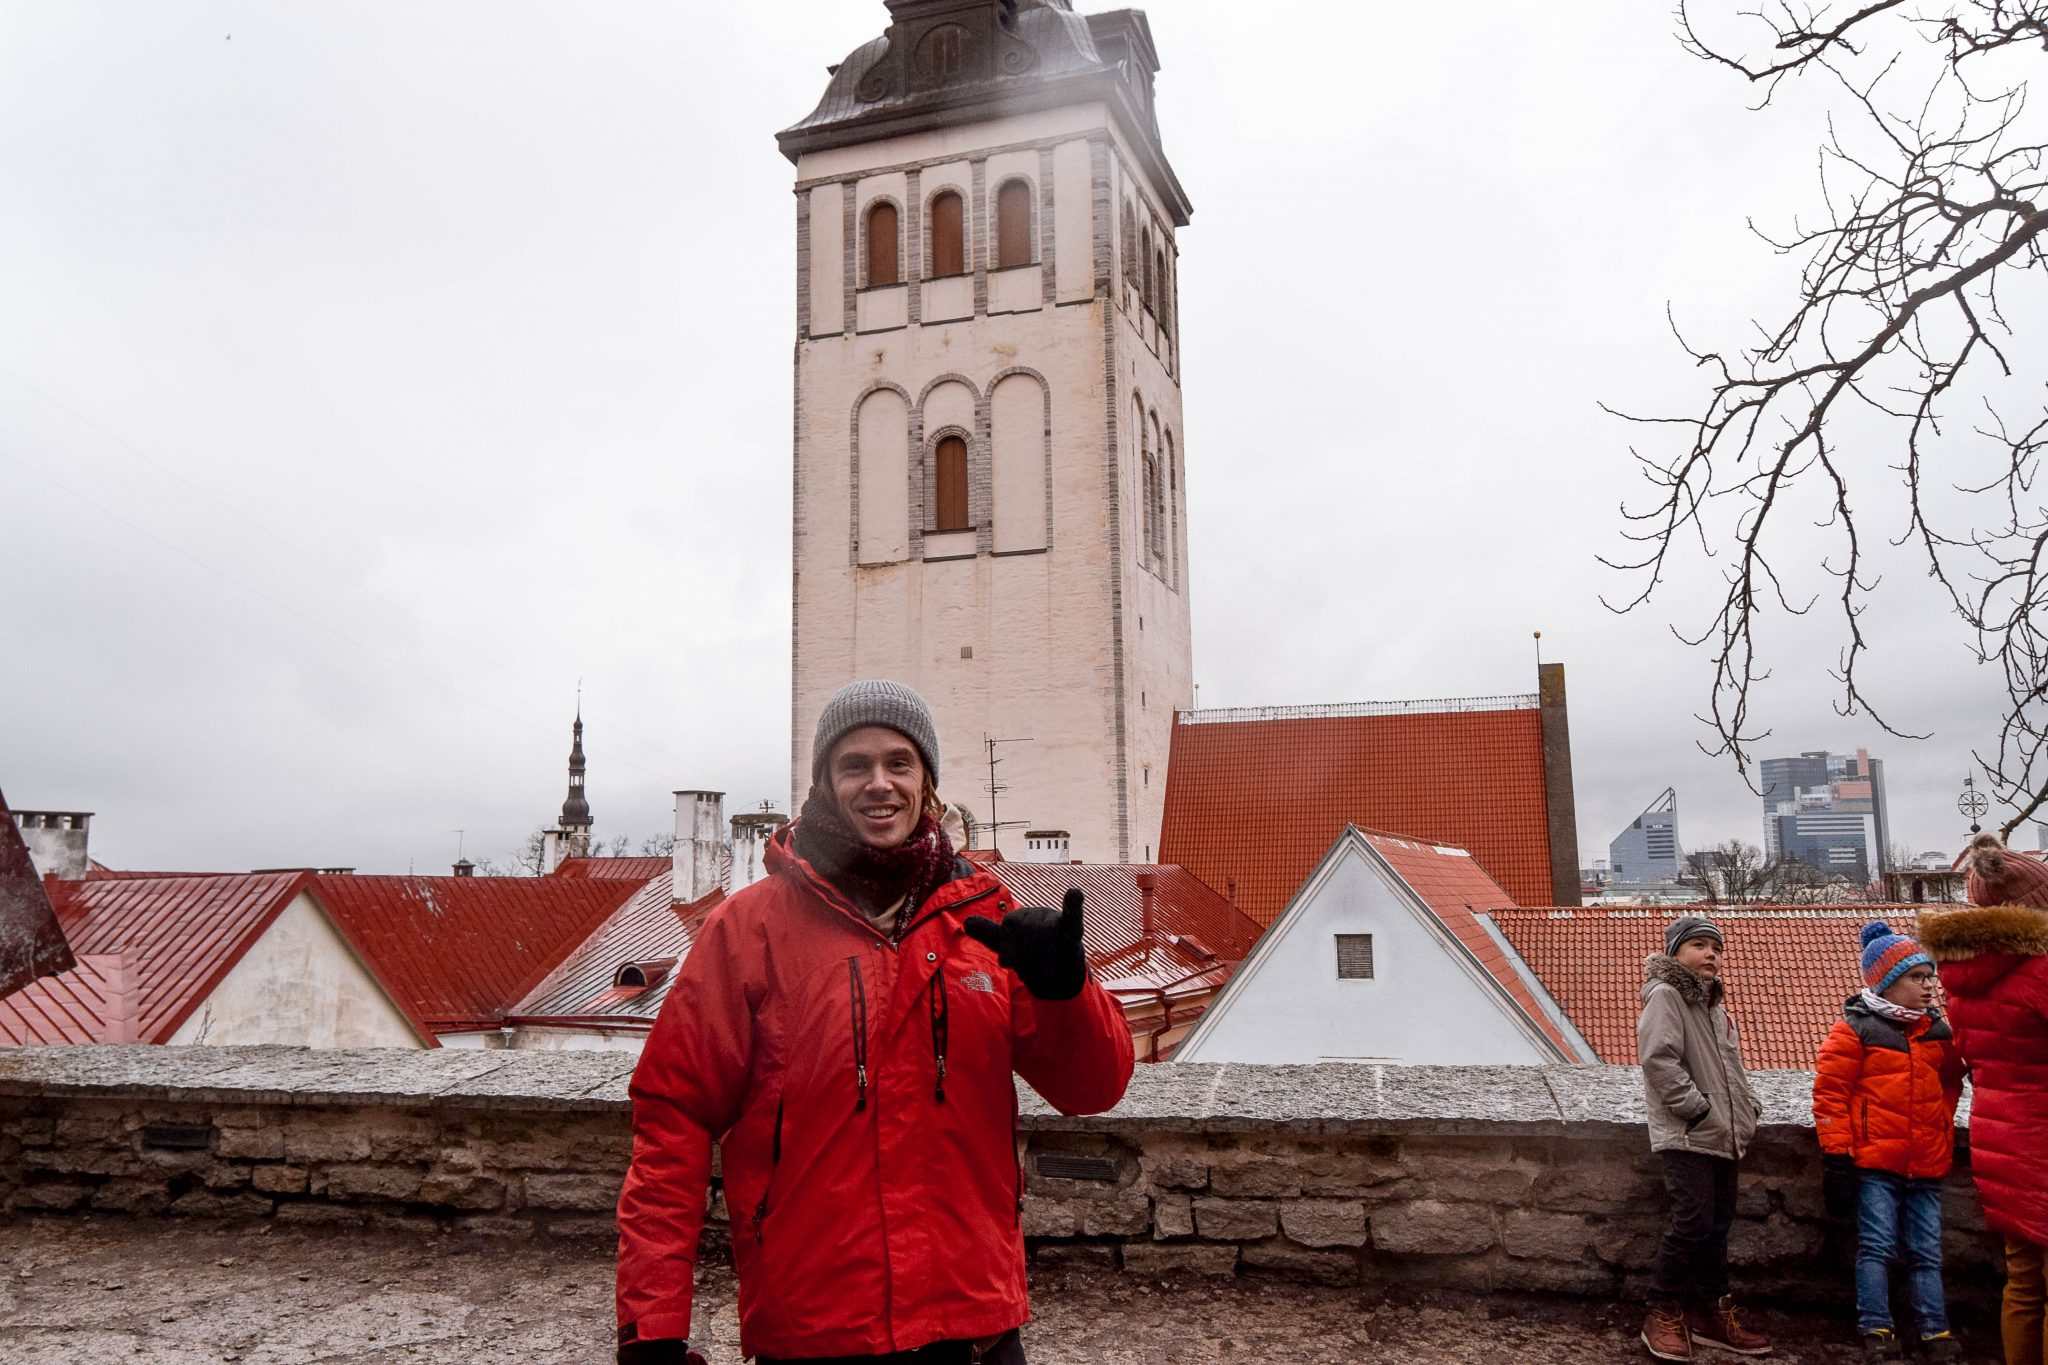 Tallinn Viewpoints In Tallinn - Danish King Garden